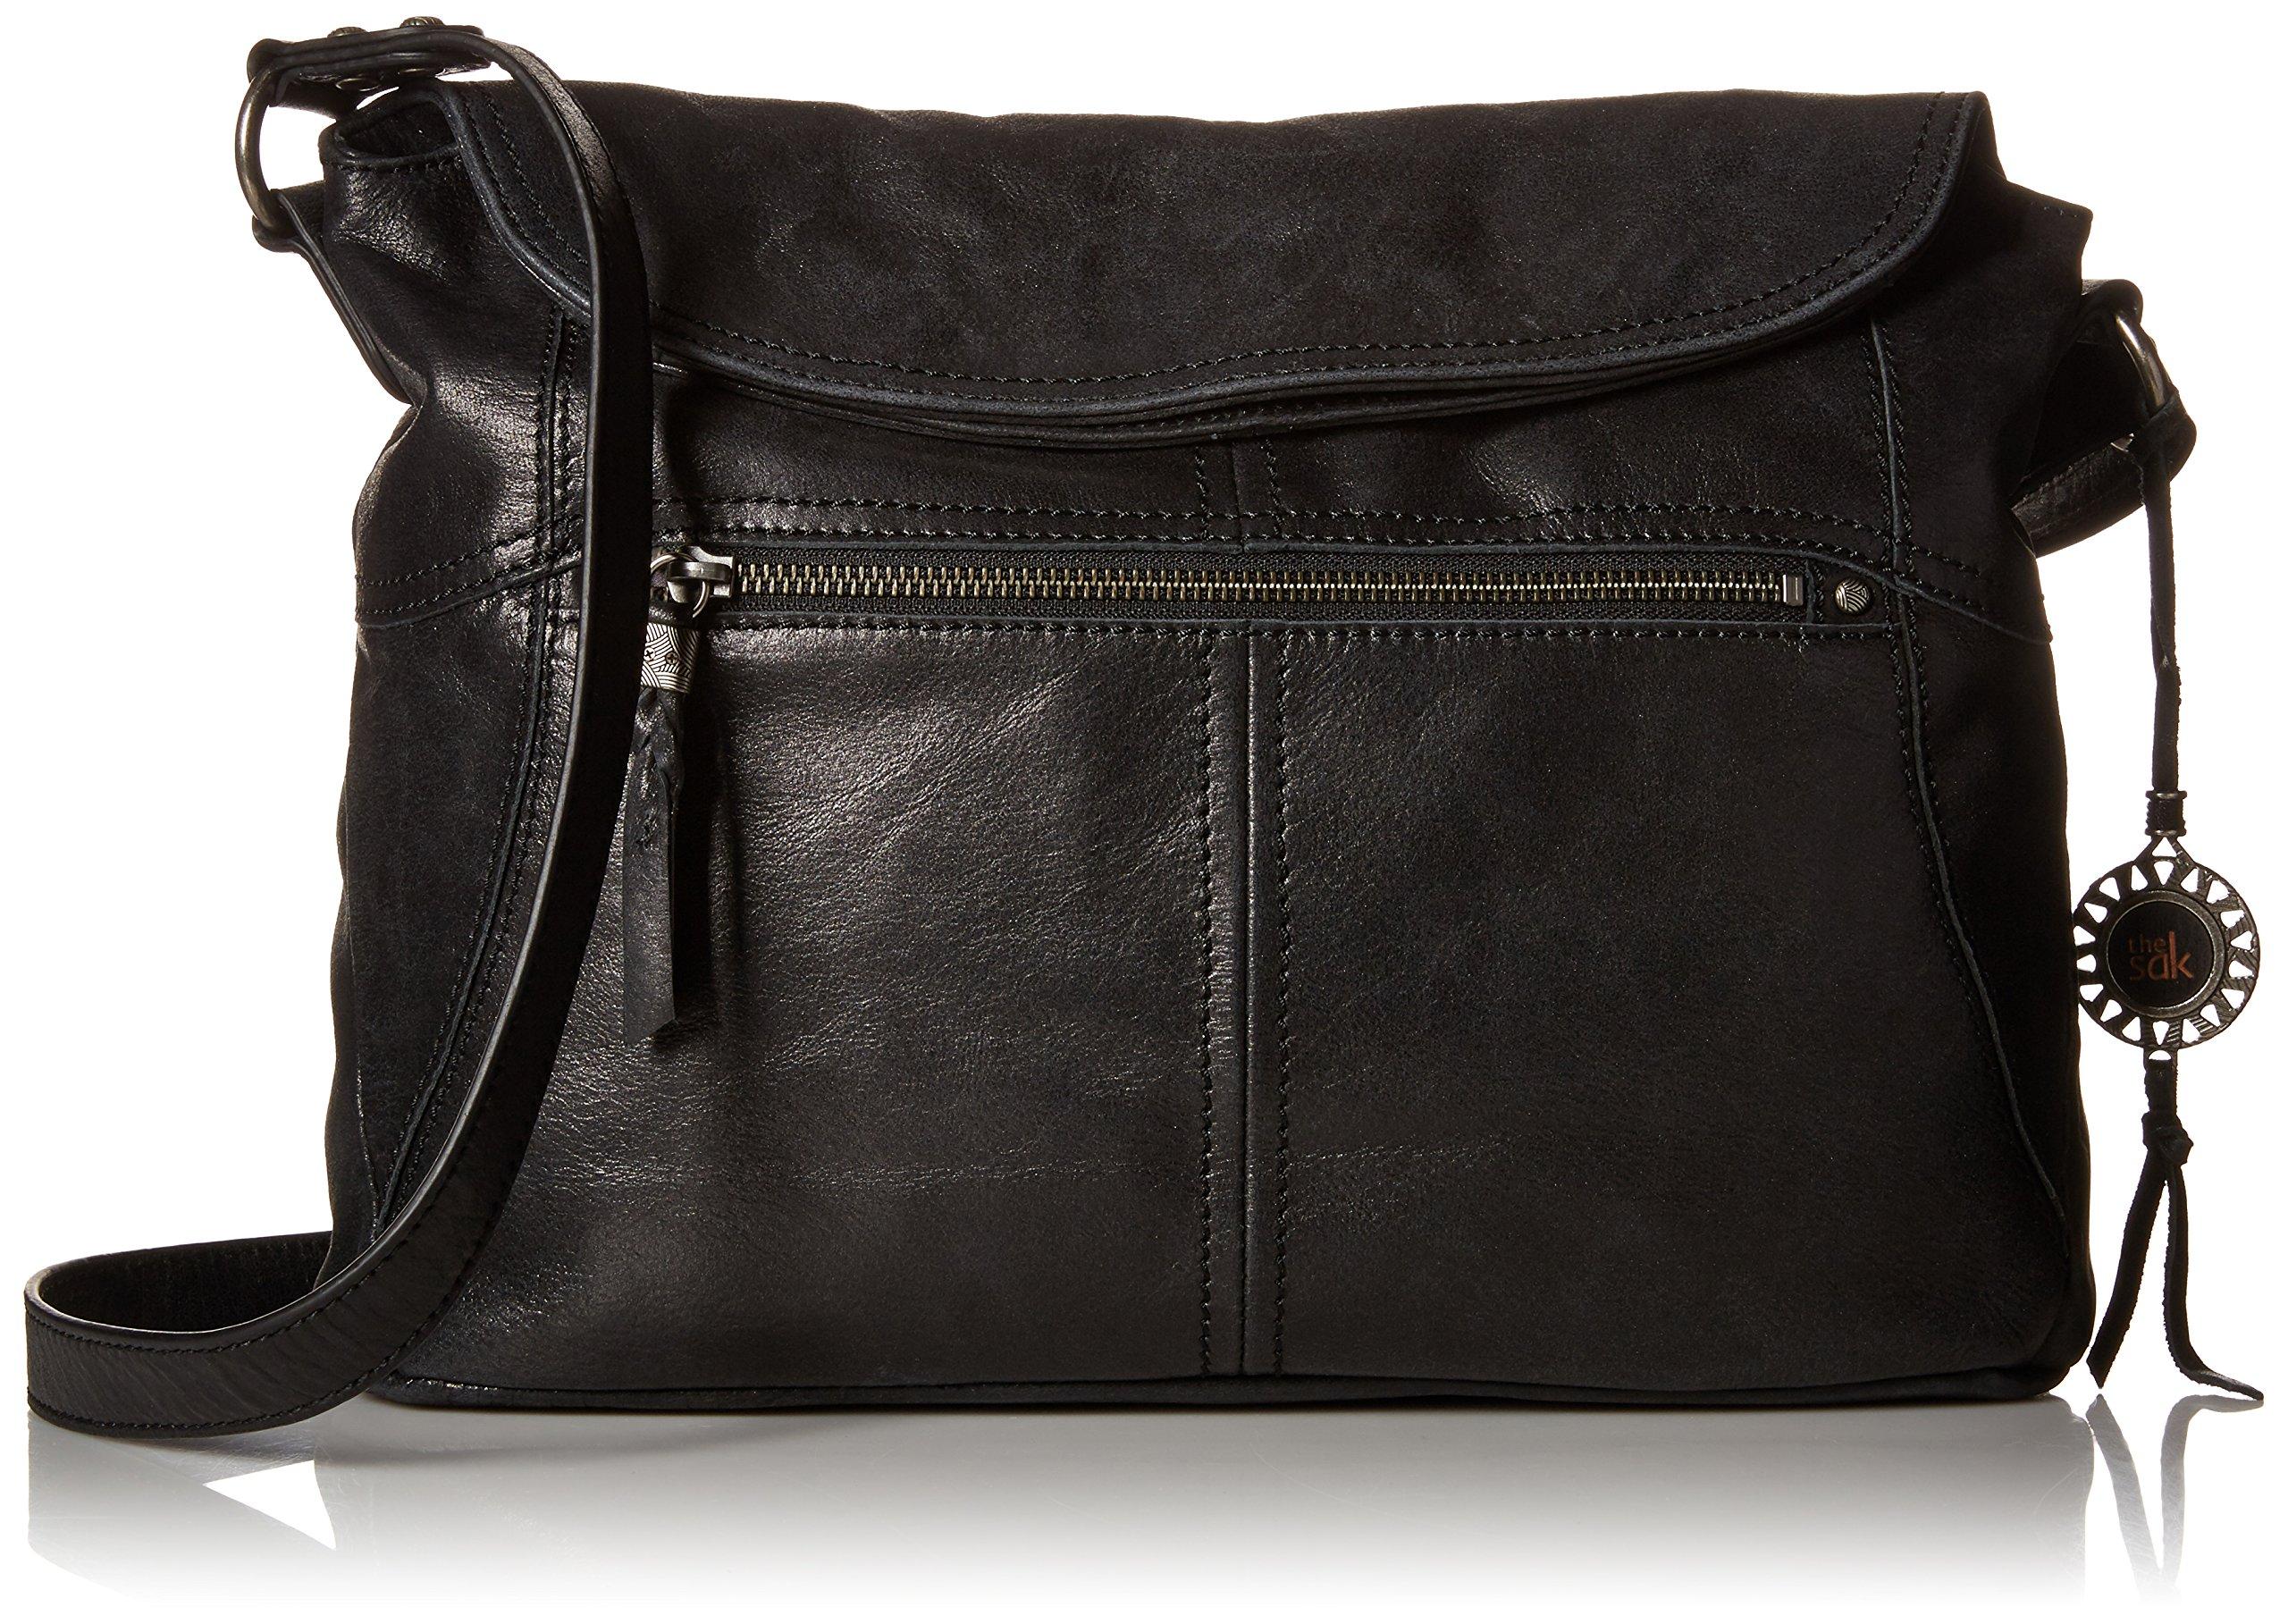 The Sak Esperato Flap Hobo Convertible Cross Body Bag,Black,One size